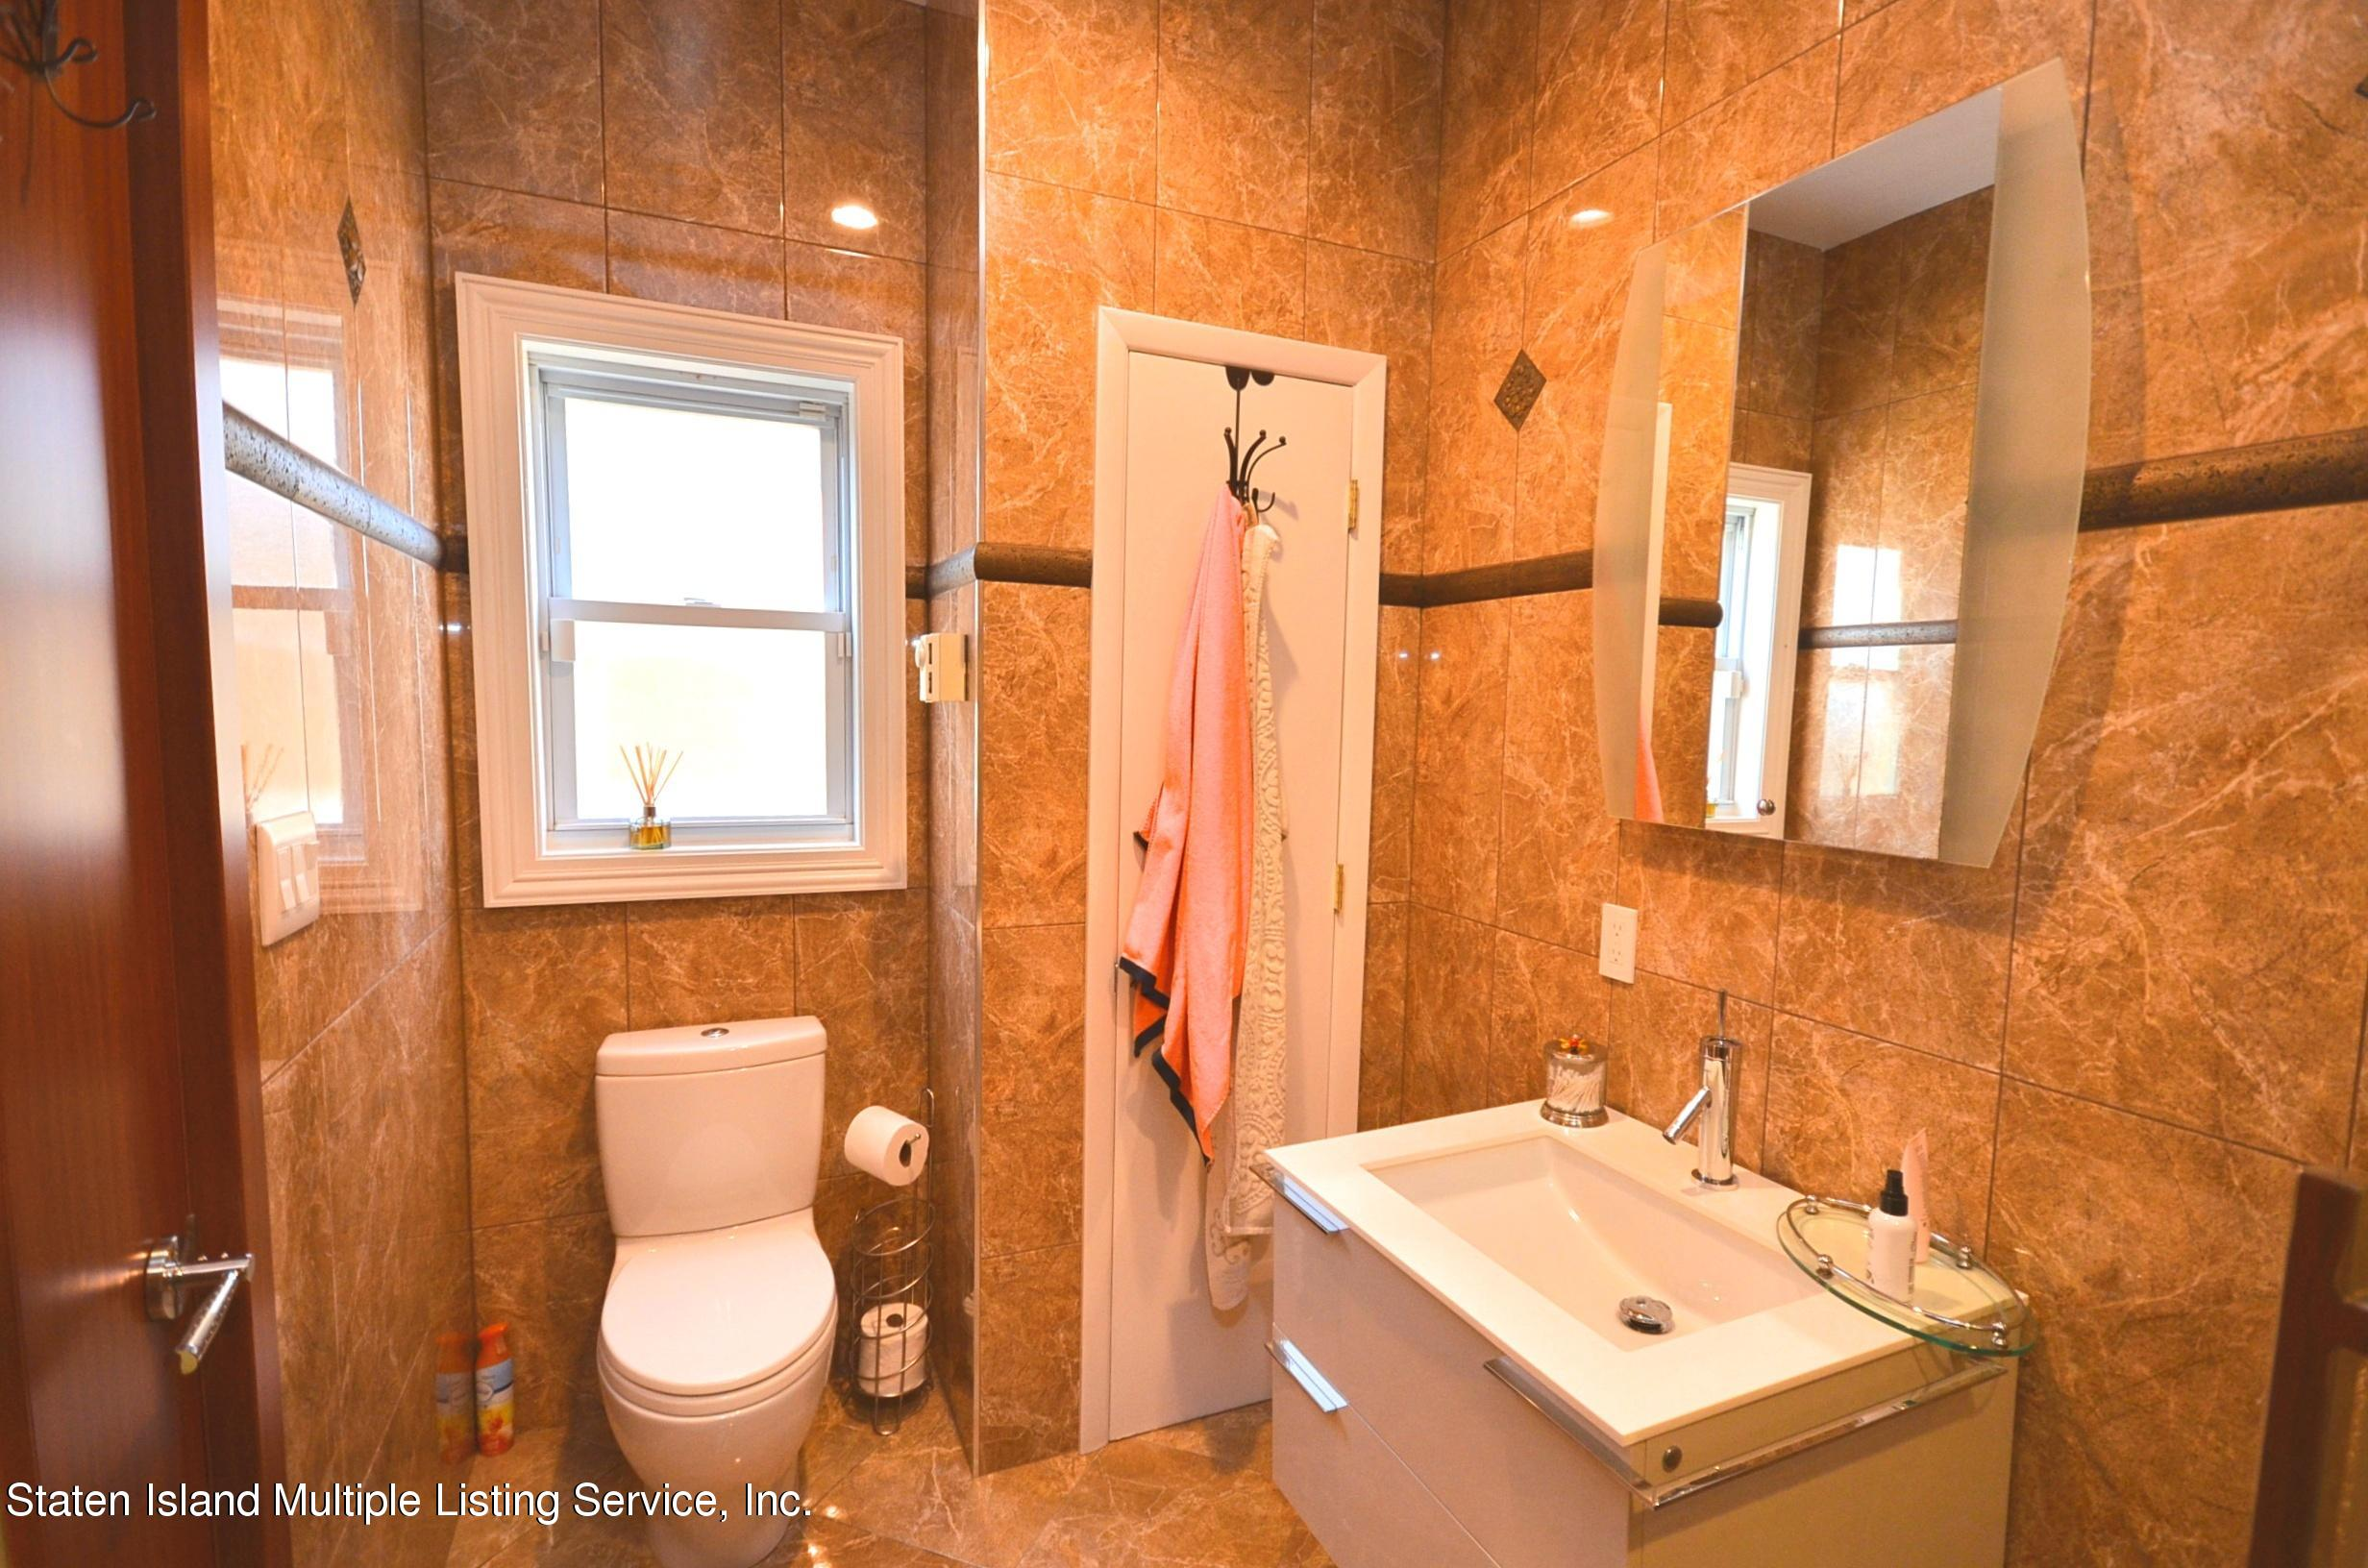 Single Family - Detached 48 Ocean Terrace  Staten Island, NY 10314, MLS-1142240-28